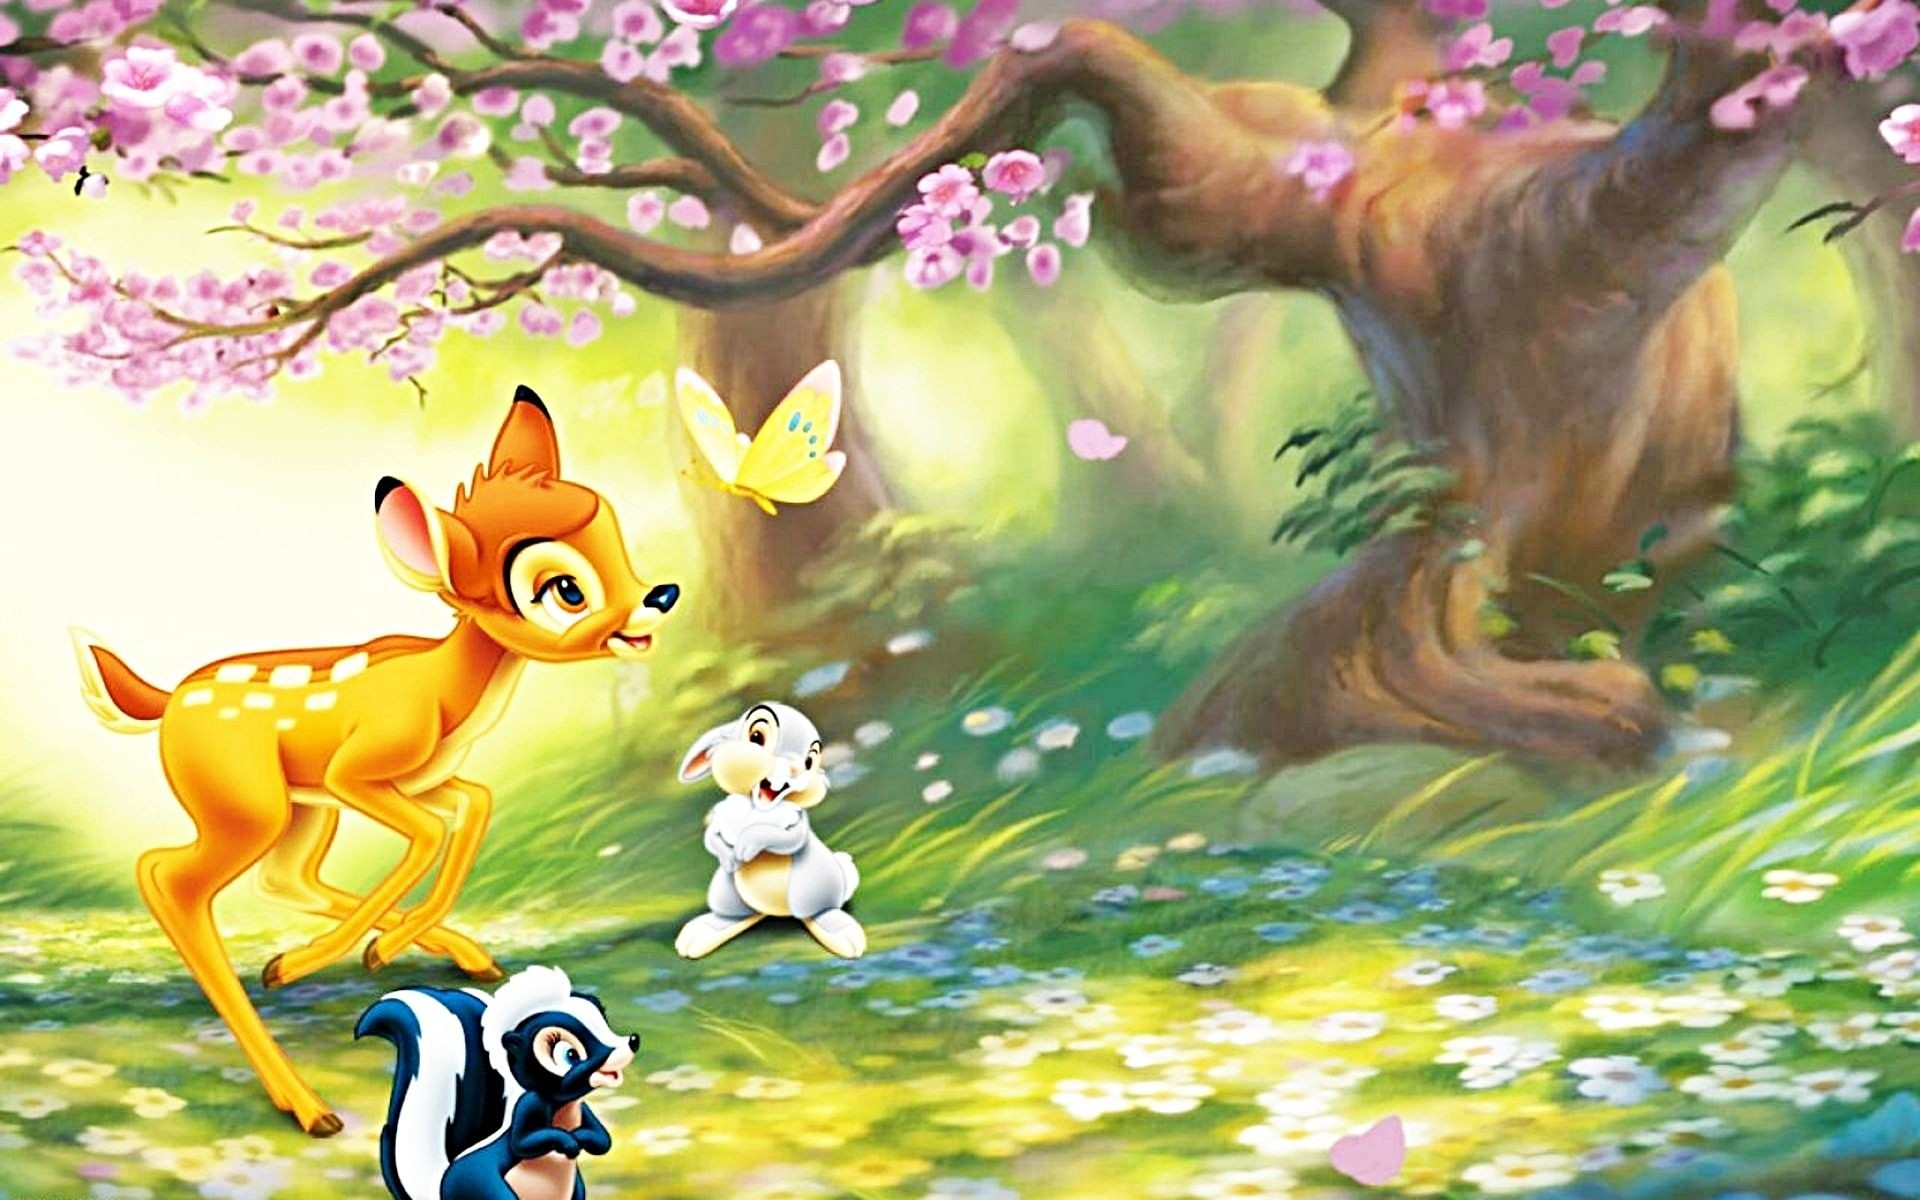 Res: 1920x1200, 15593) Disney Character HD Desktop Background Wallpaper - WalOps.com